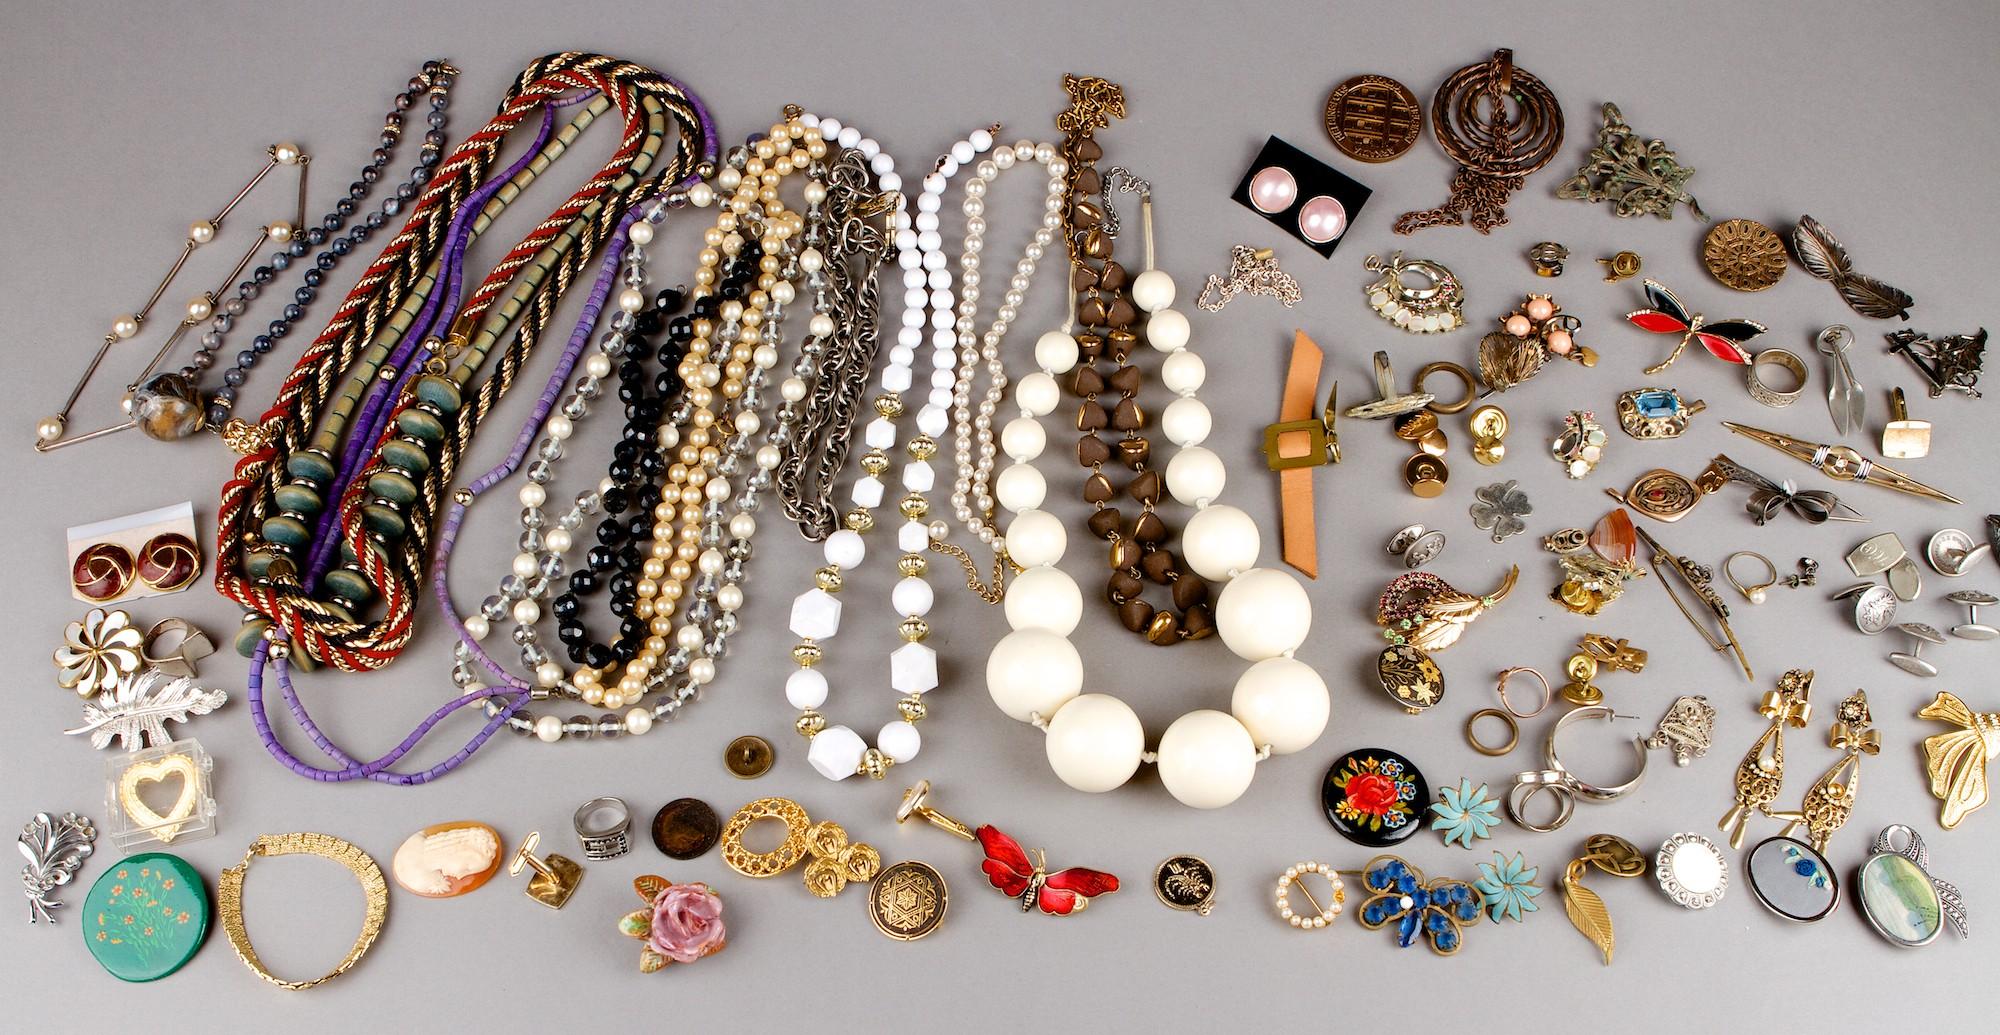 A set of costume jewelry